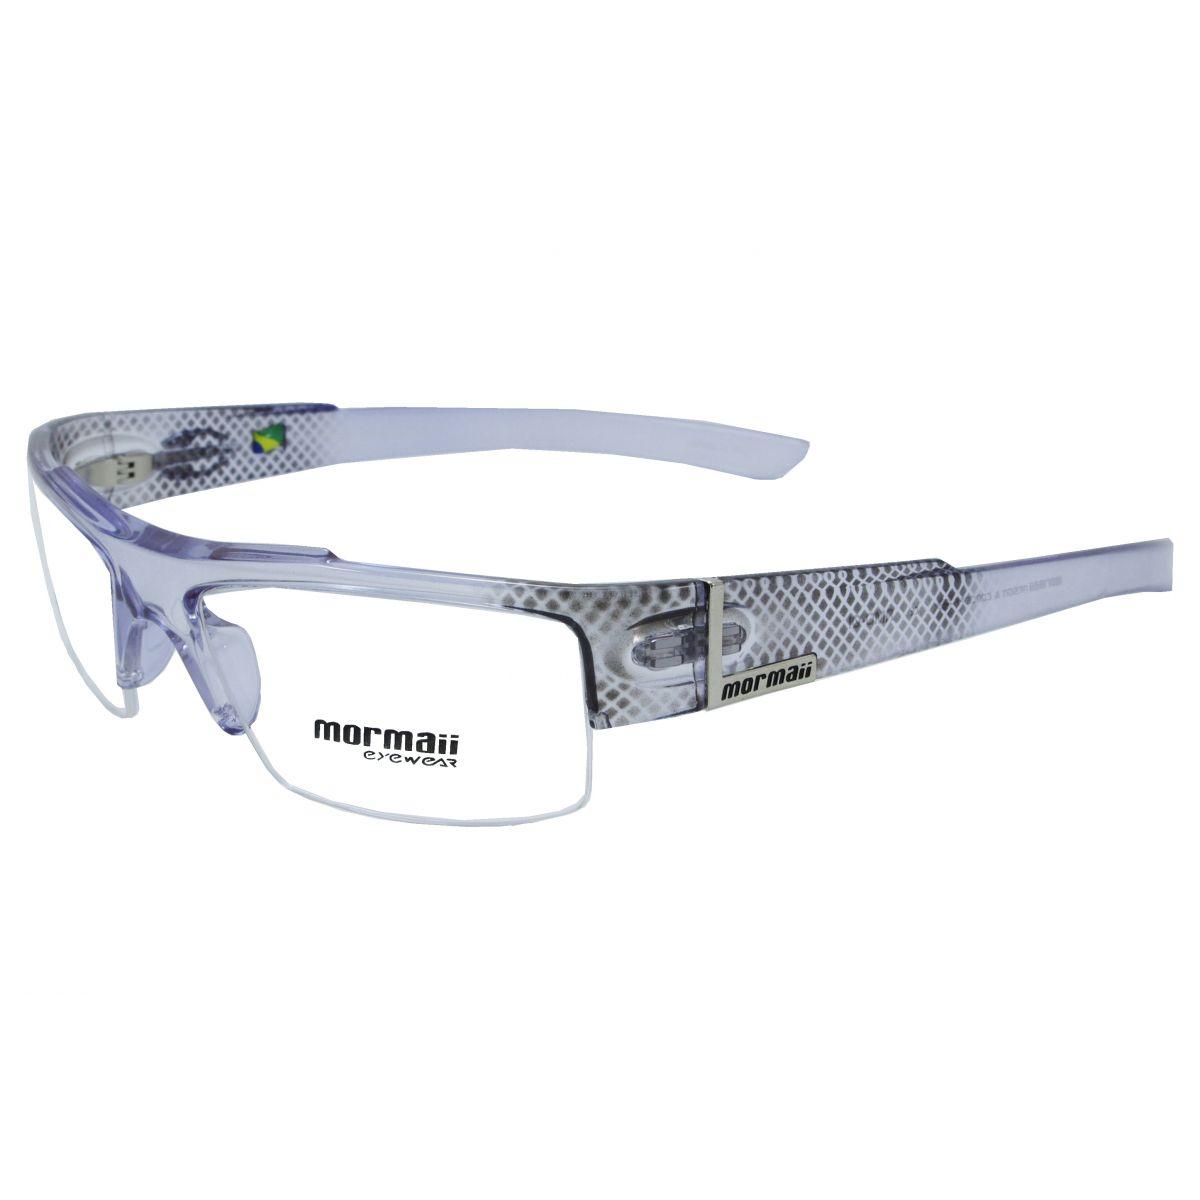 Óculos De Grau Mormaii Atol 1 1267 696 Tam.52MormaiiMormaii de ... f806302269